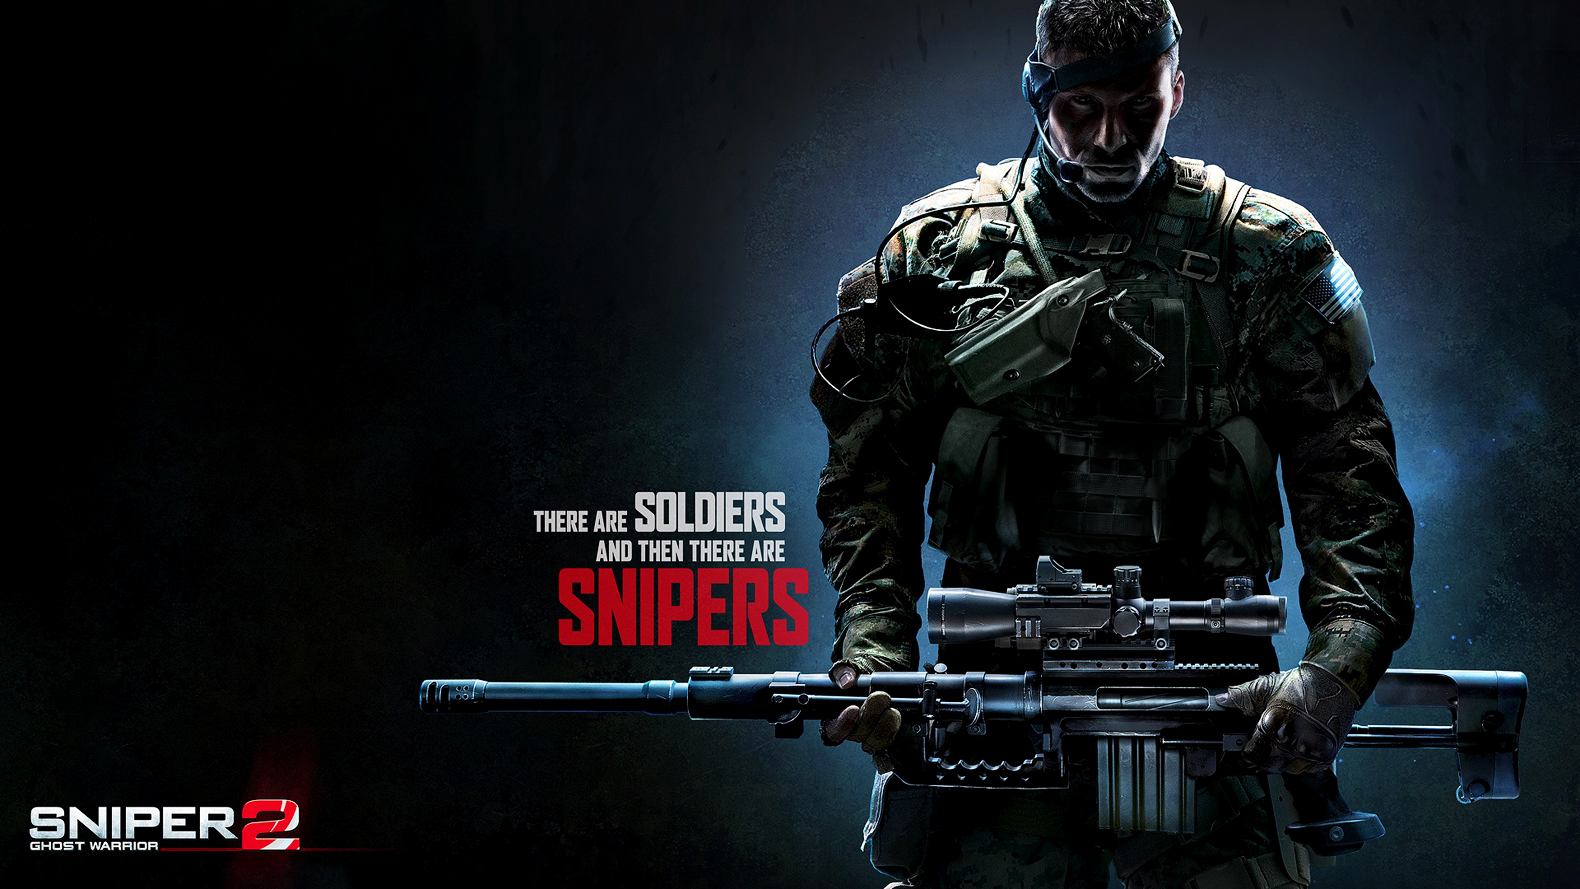 Ghost Recon Sniper Wallpaper hd Sniper 2 Ghost Warrior hd 1580x889